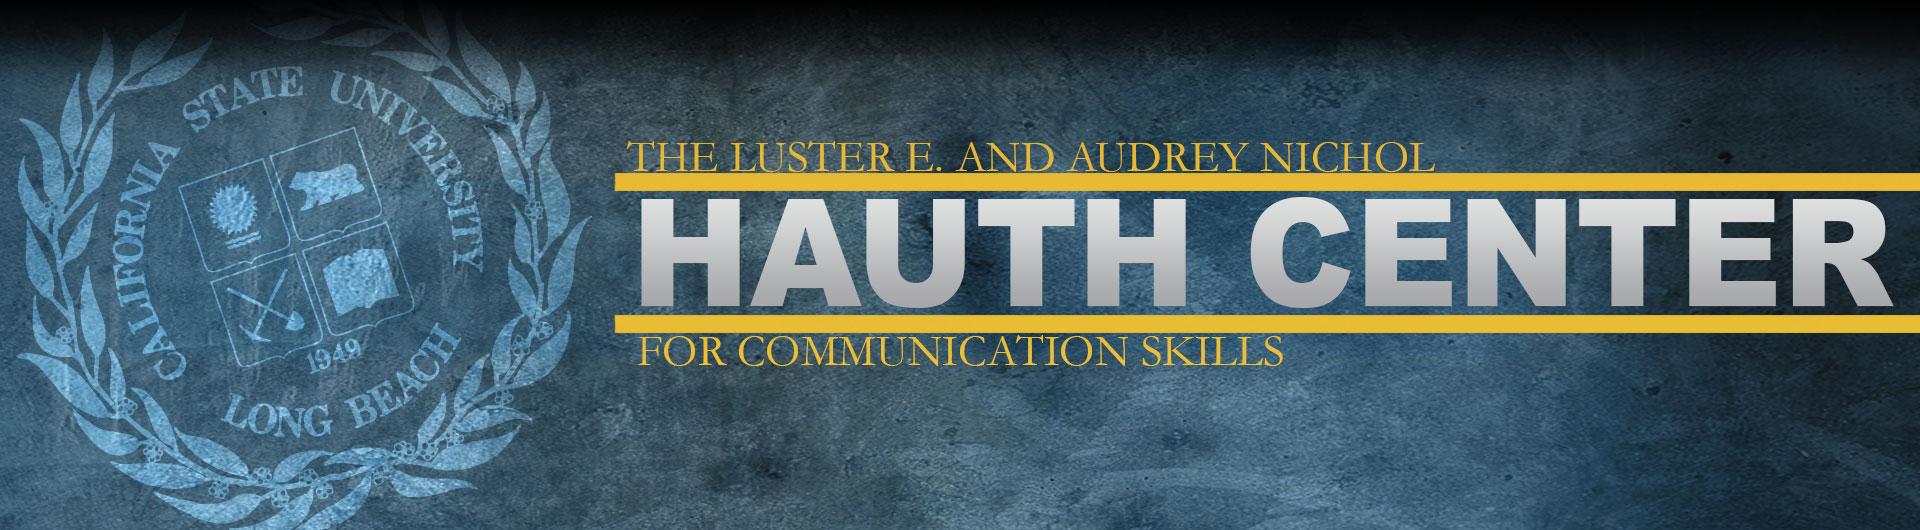 Hauth Center